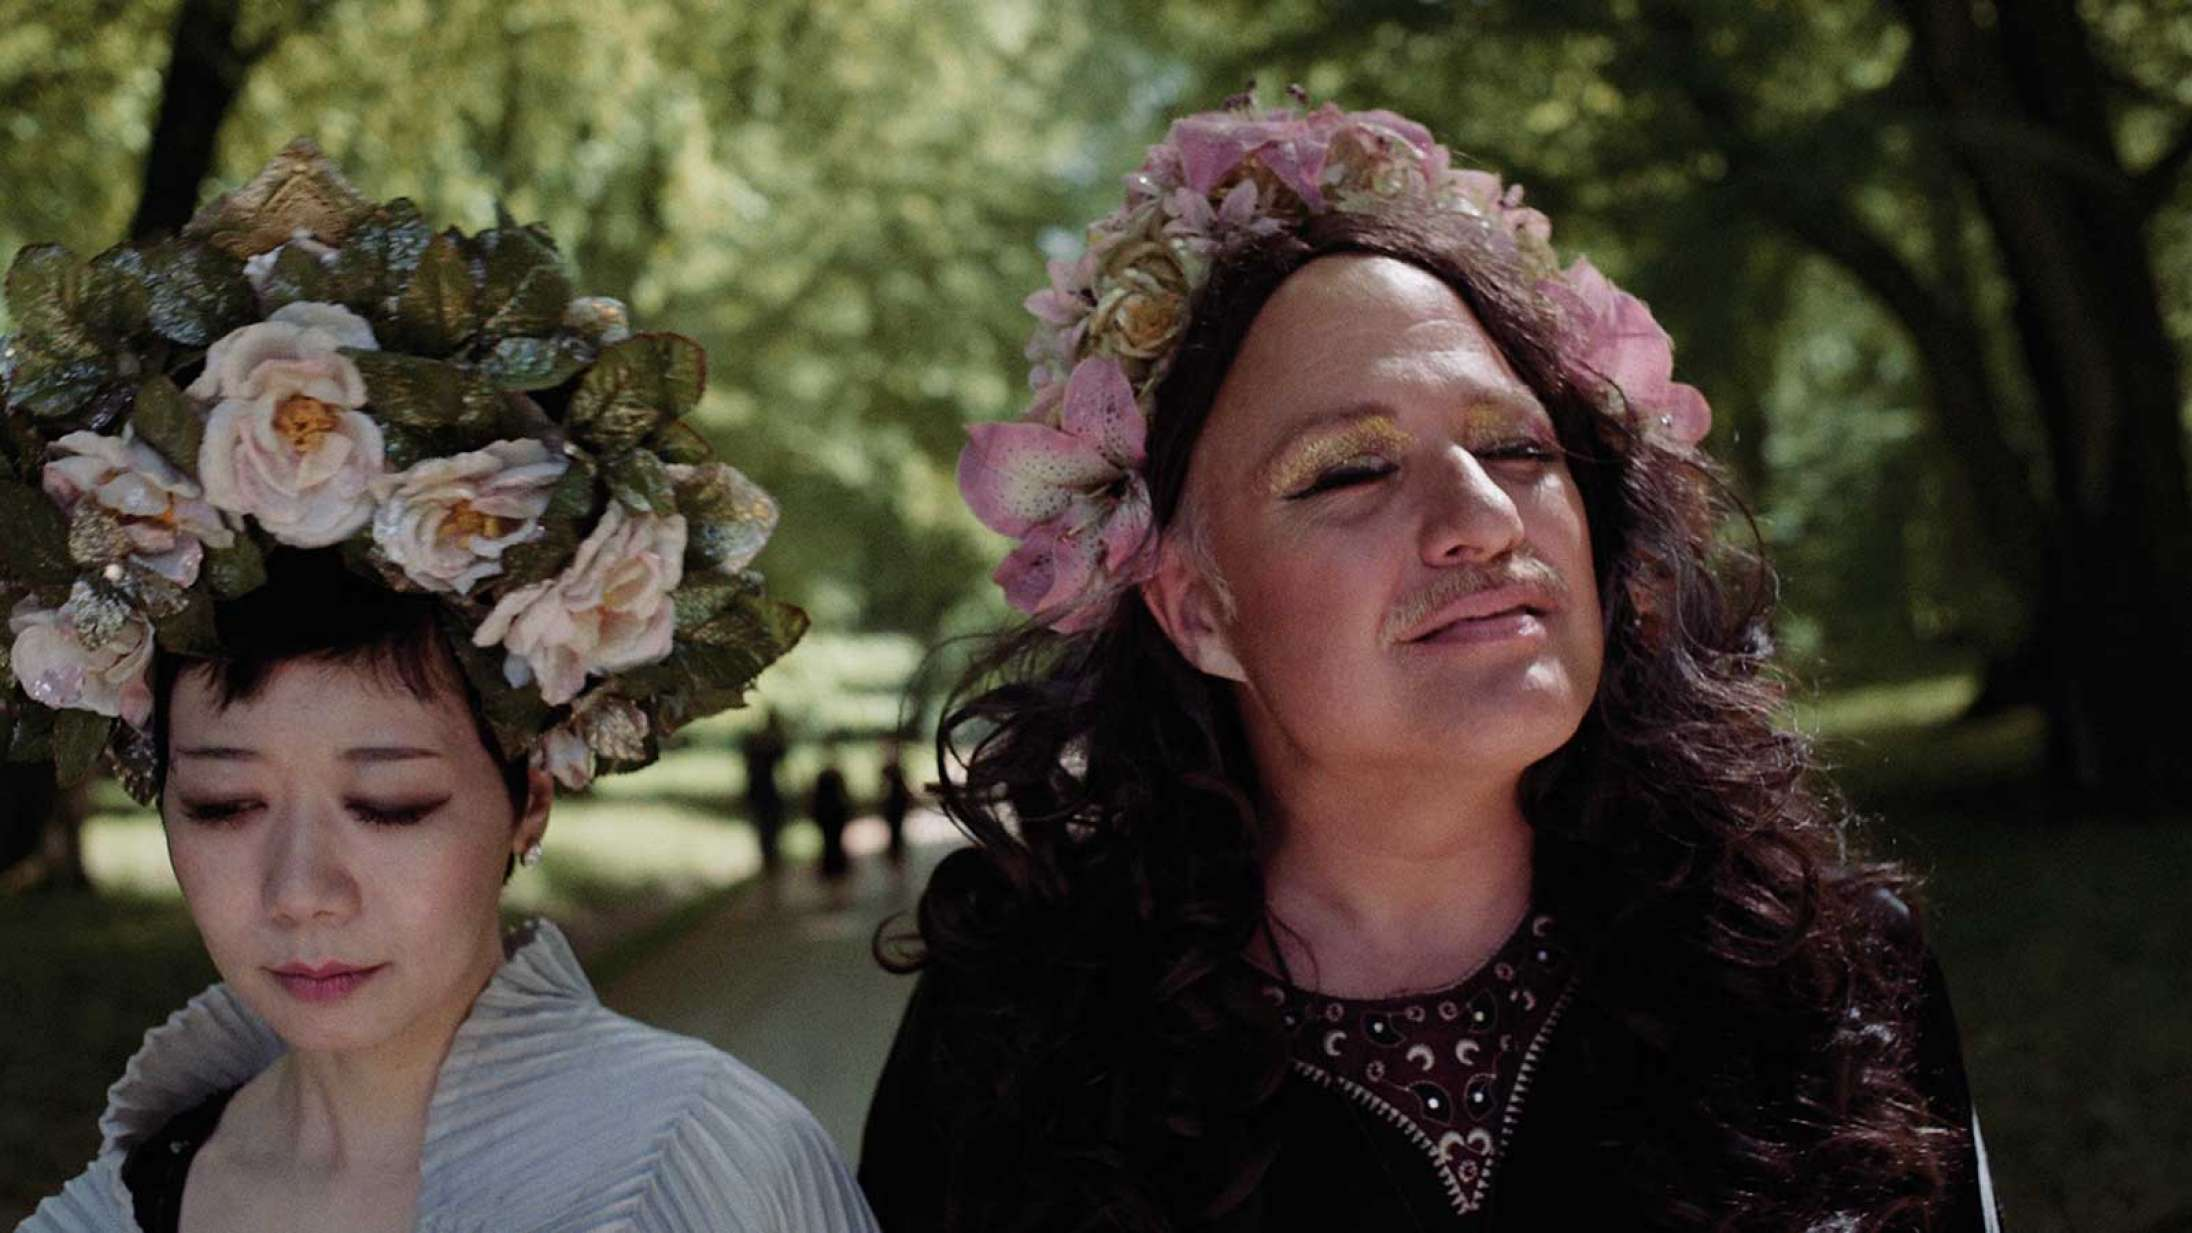 'Being Eriko': Vild performancekunstner er en fascinationsmagnet i ny dansk dokumentar